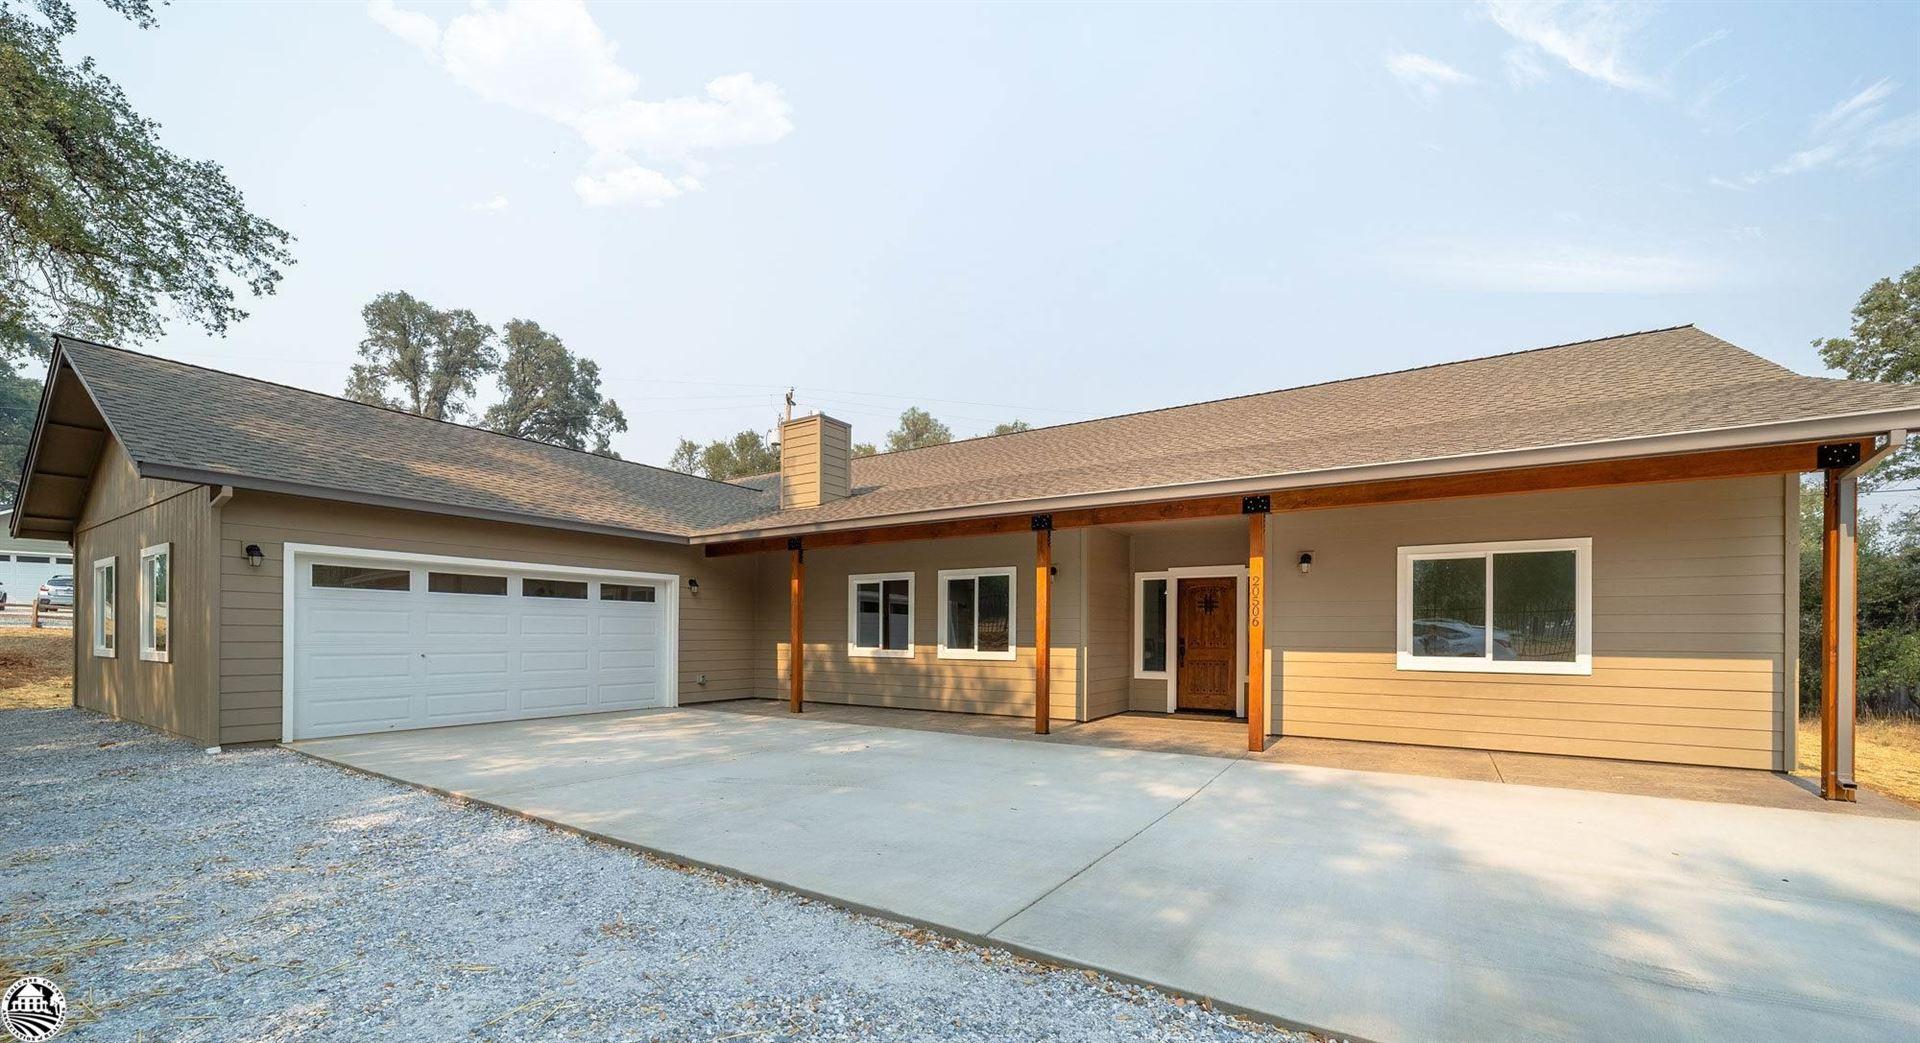 20506 Phoenix Lake, Sonora, CA 95370 - MLS#: 20201313